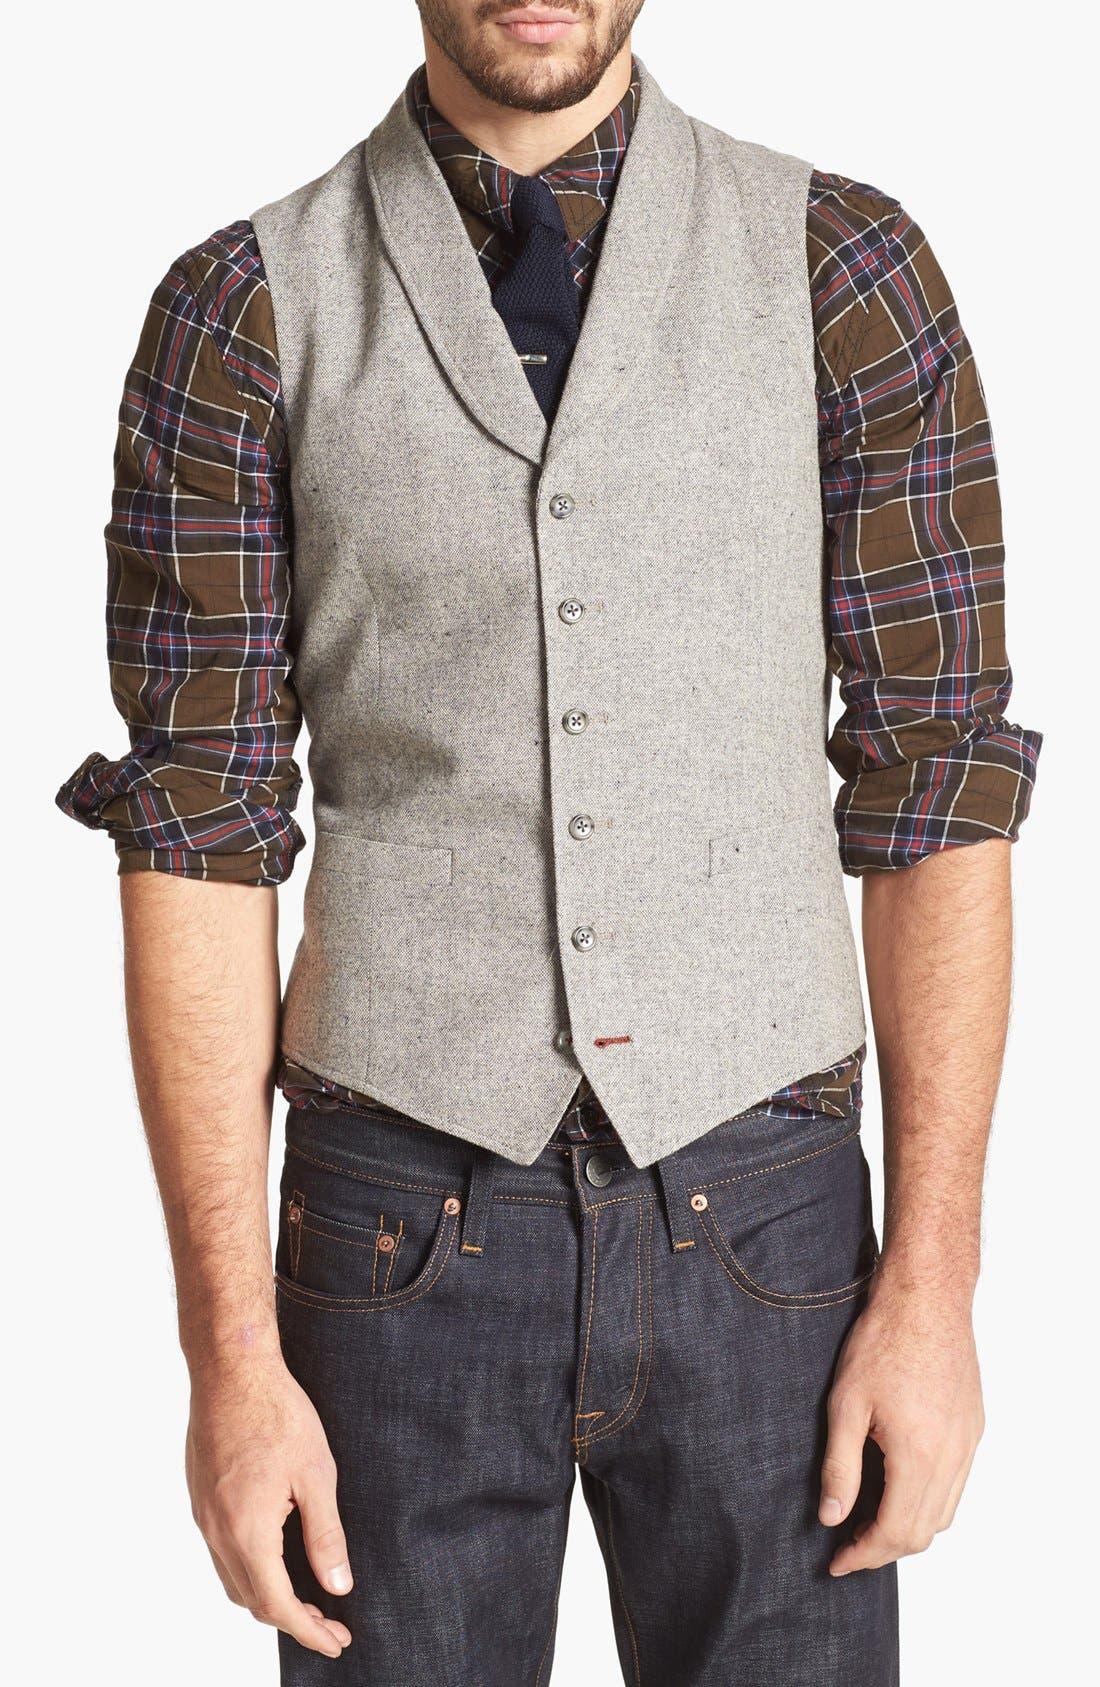 Alternate Image 1 Selected - 1901 Shawl Collar Grey Flannel Vest